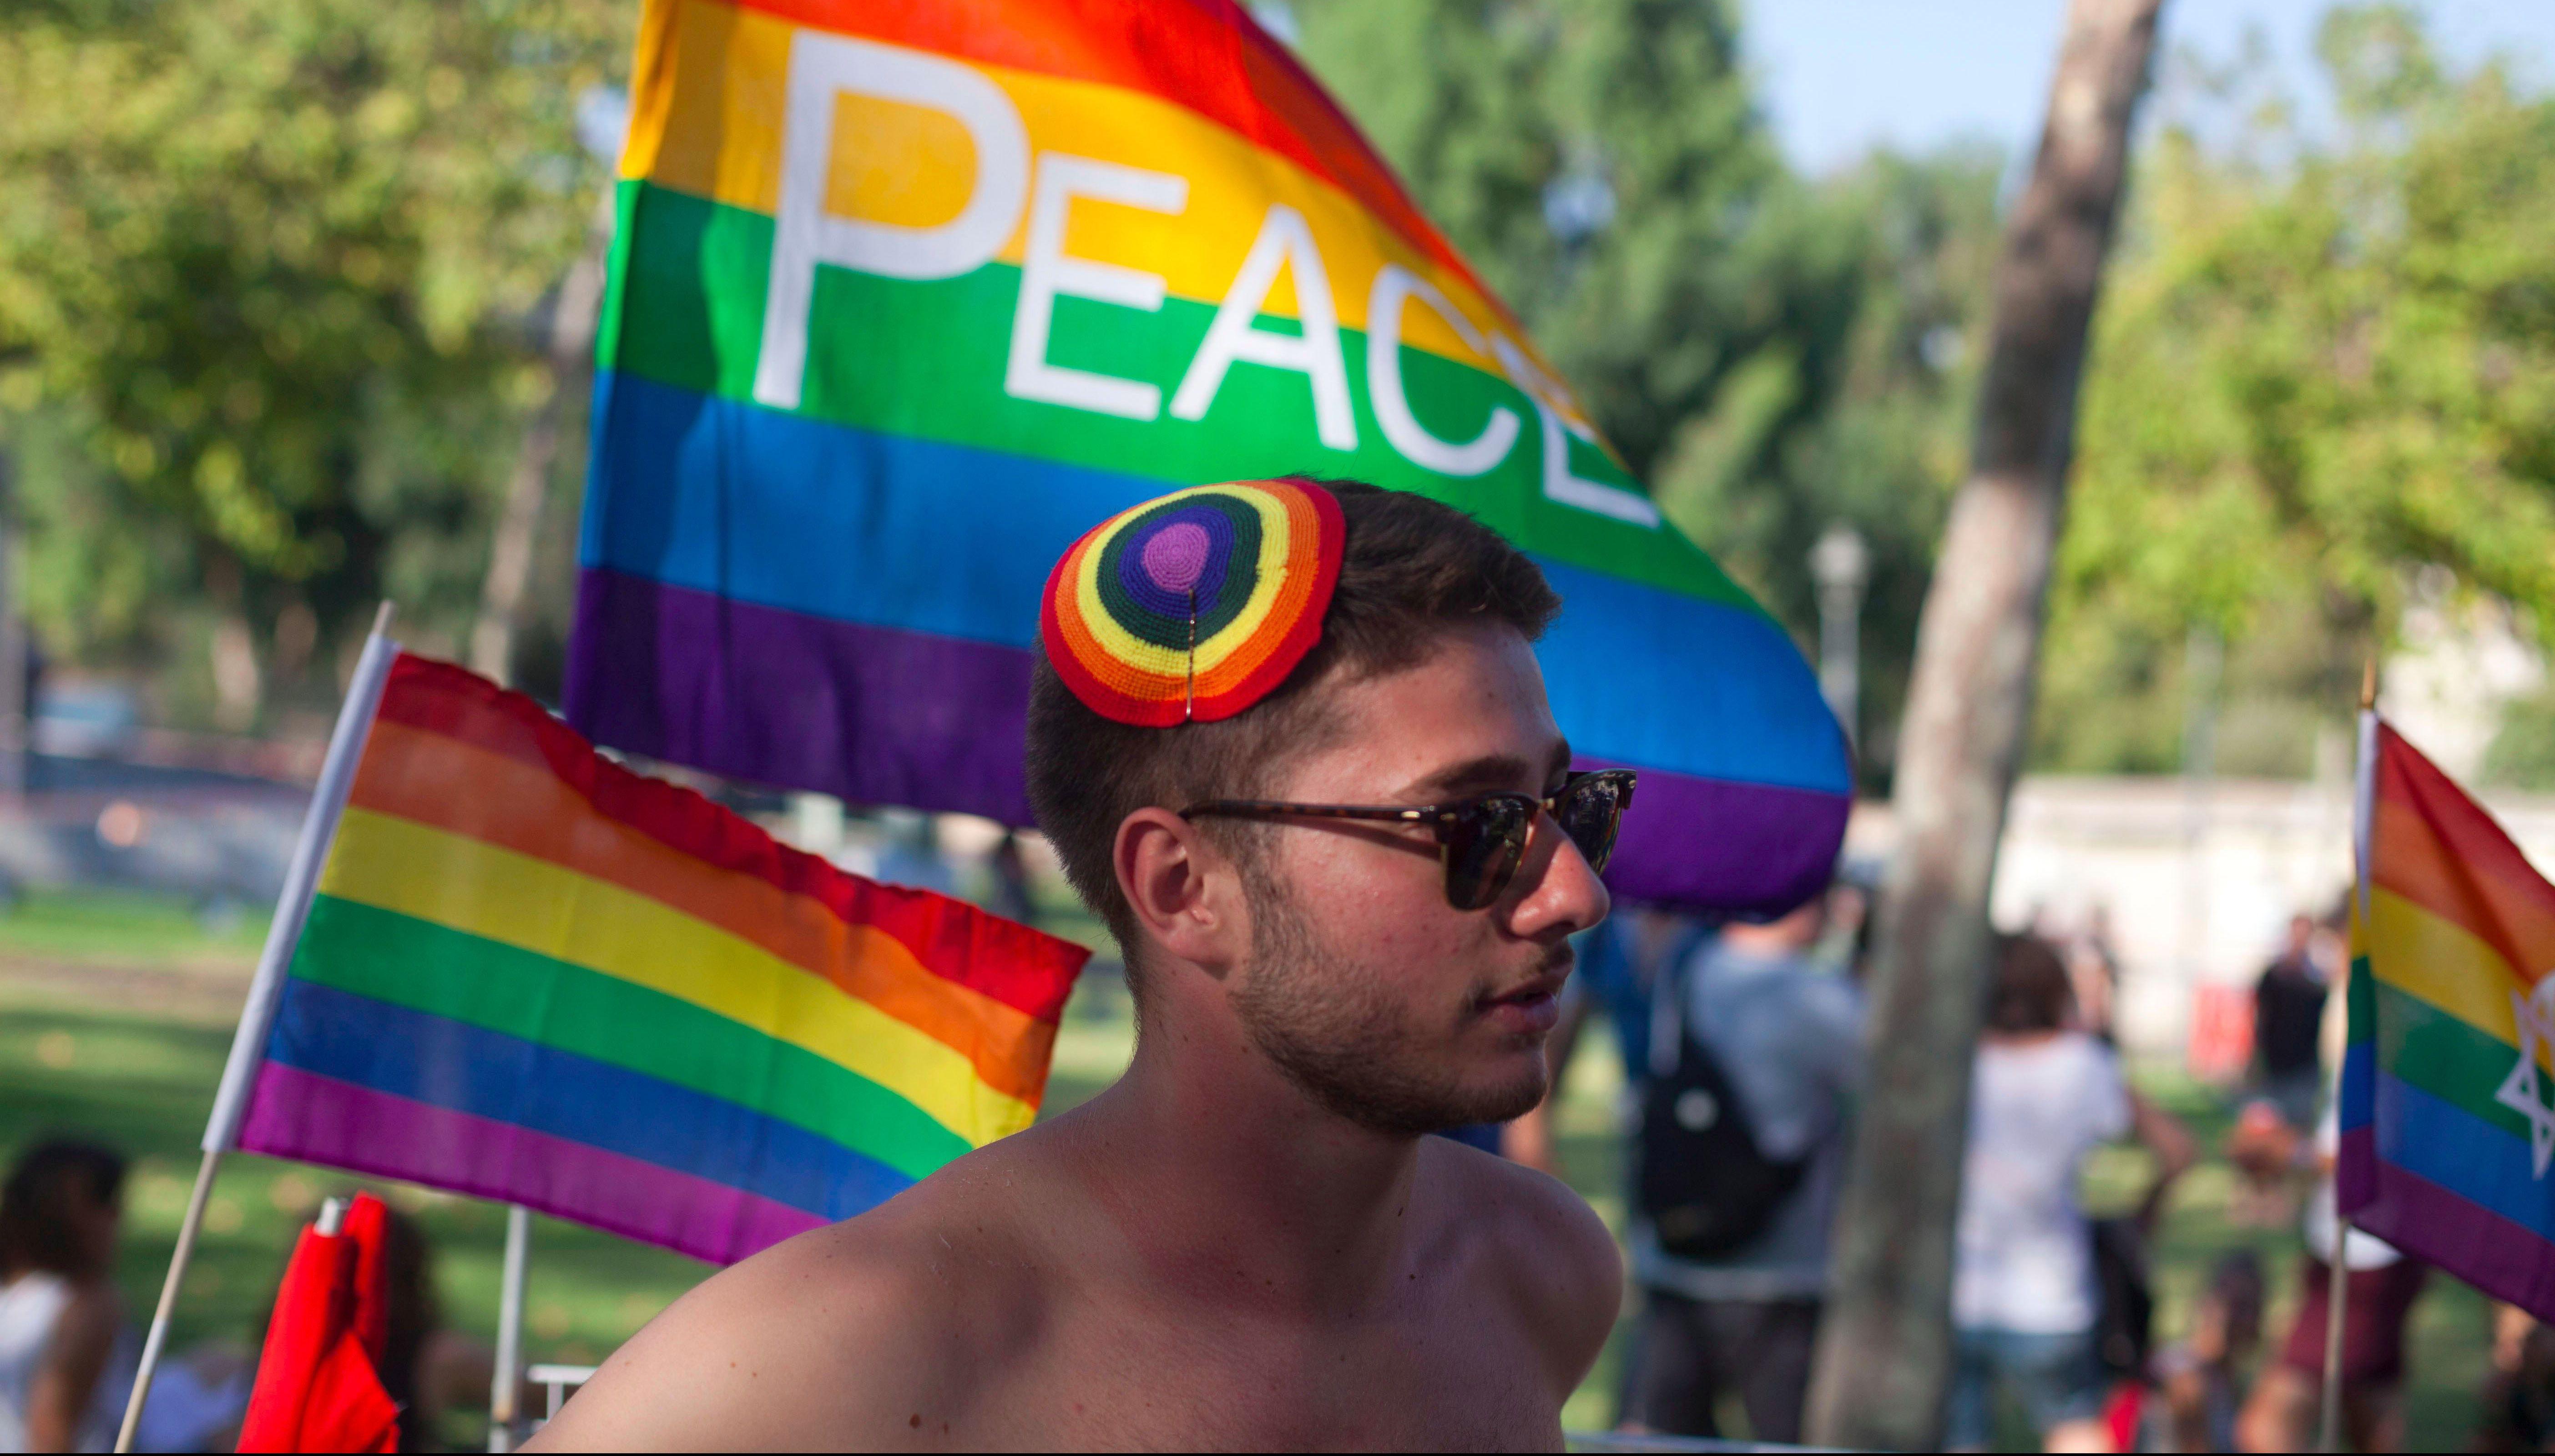 A marcher at the 2015 Jerusalem pride march.